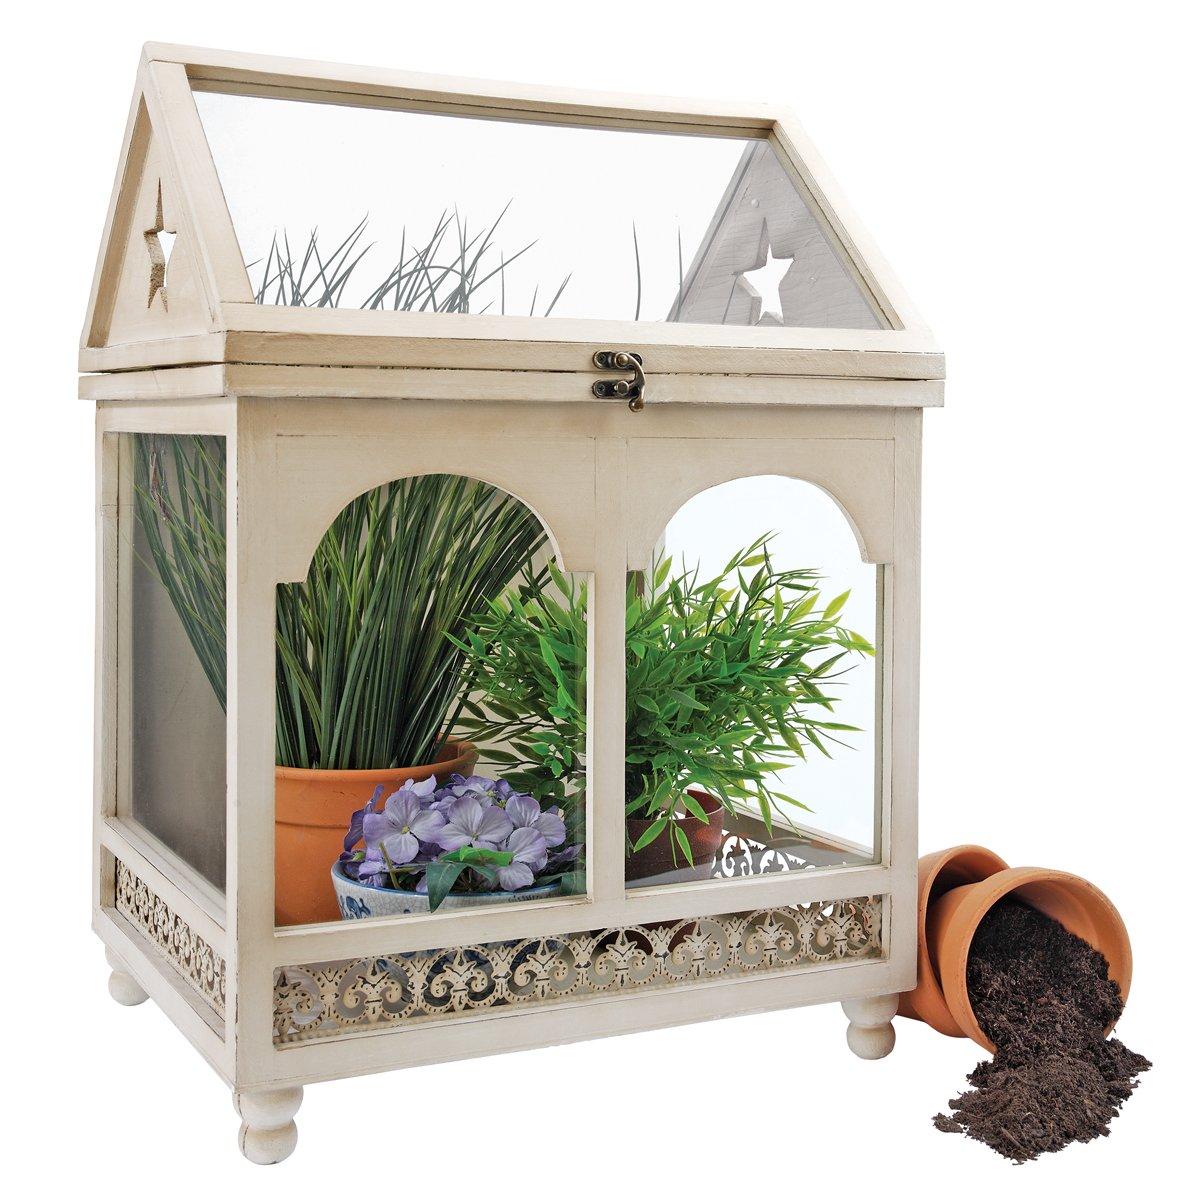 Amazon.com: Design Toscano Wooden Wardian Terrarium Plant Case: Home &  Kitchen - Amazon.com: Design Toscano Wooden Wardian Terrarium Plant Case